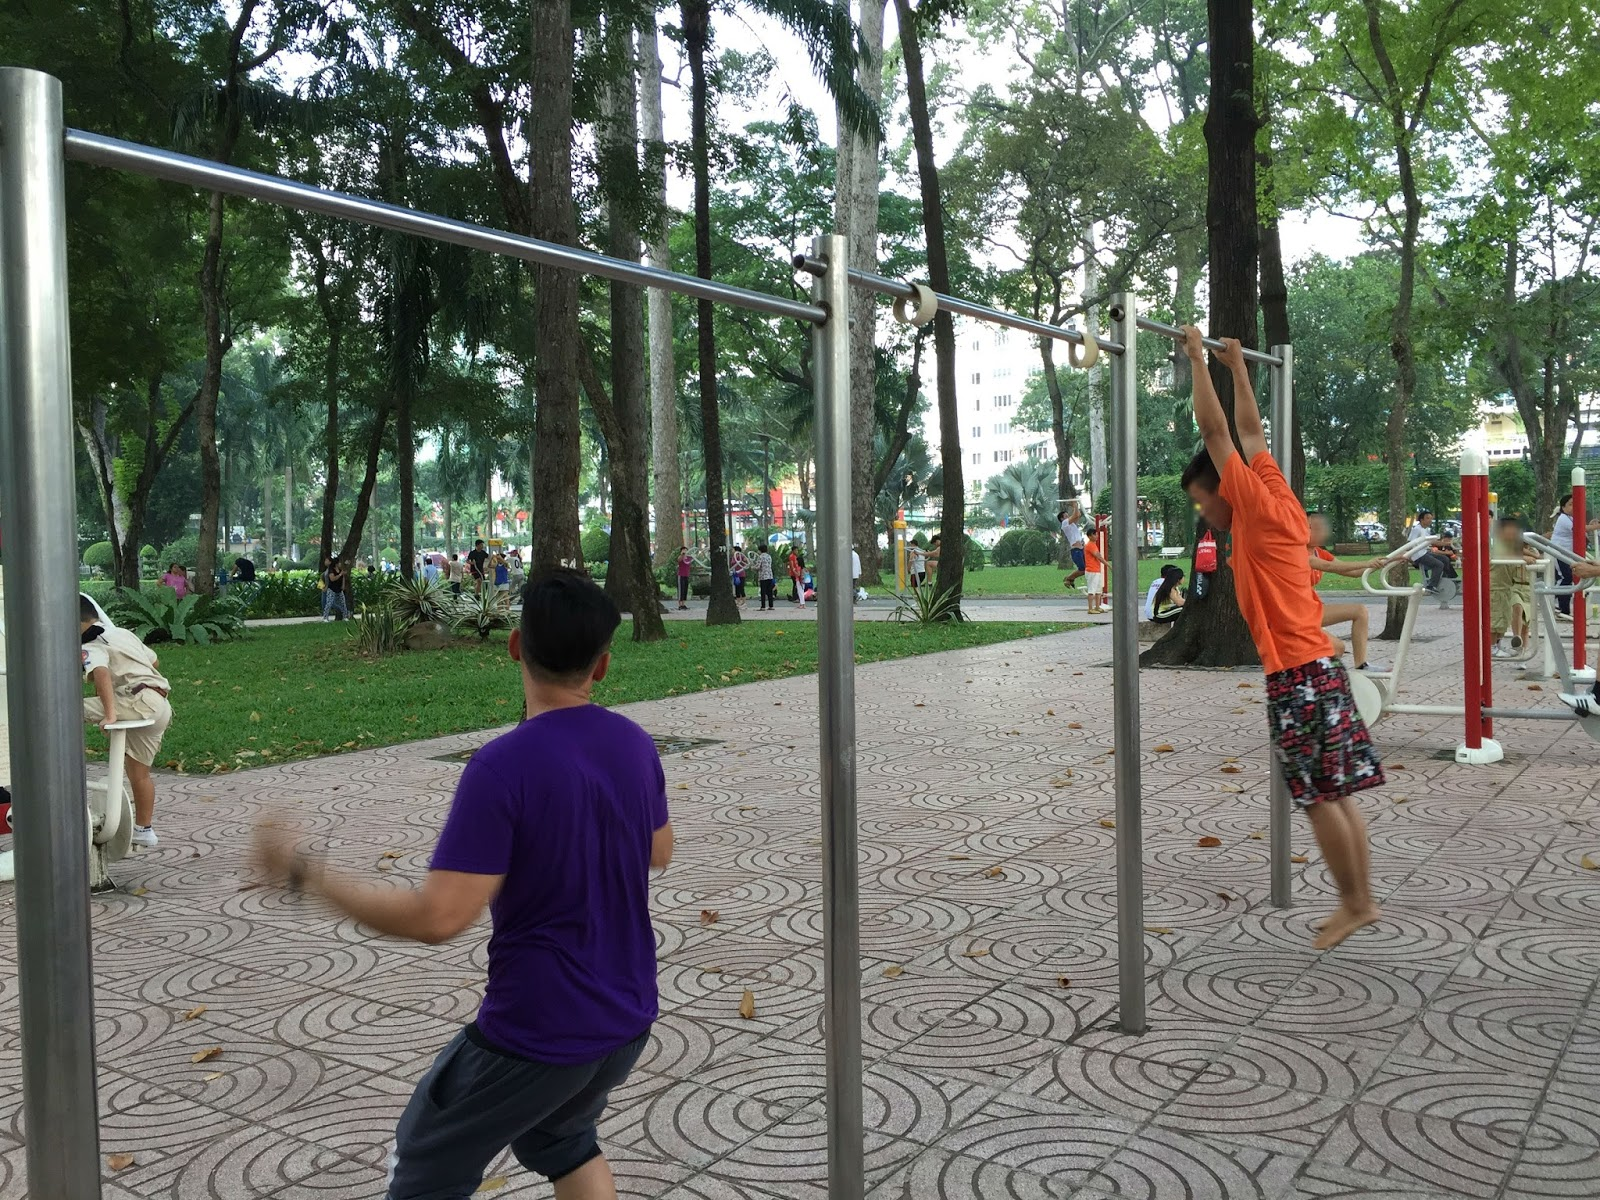 hcmc-vietnam-sport-park ベトナムの公園とアスレチック3